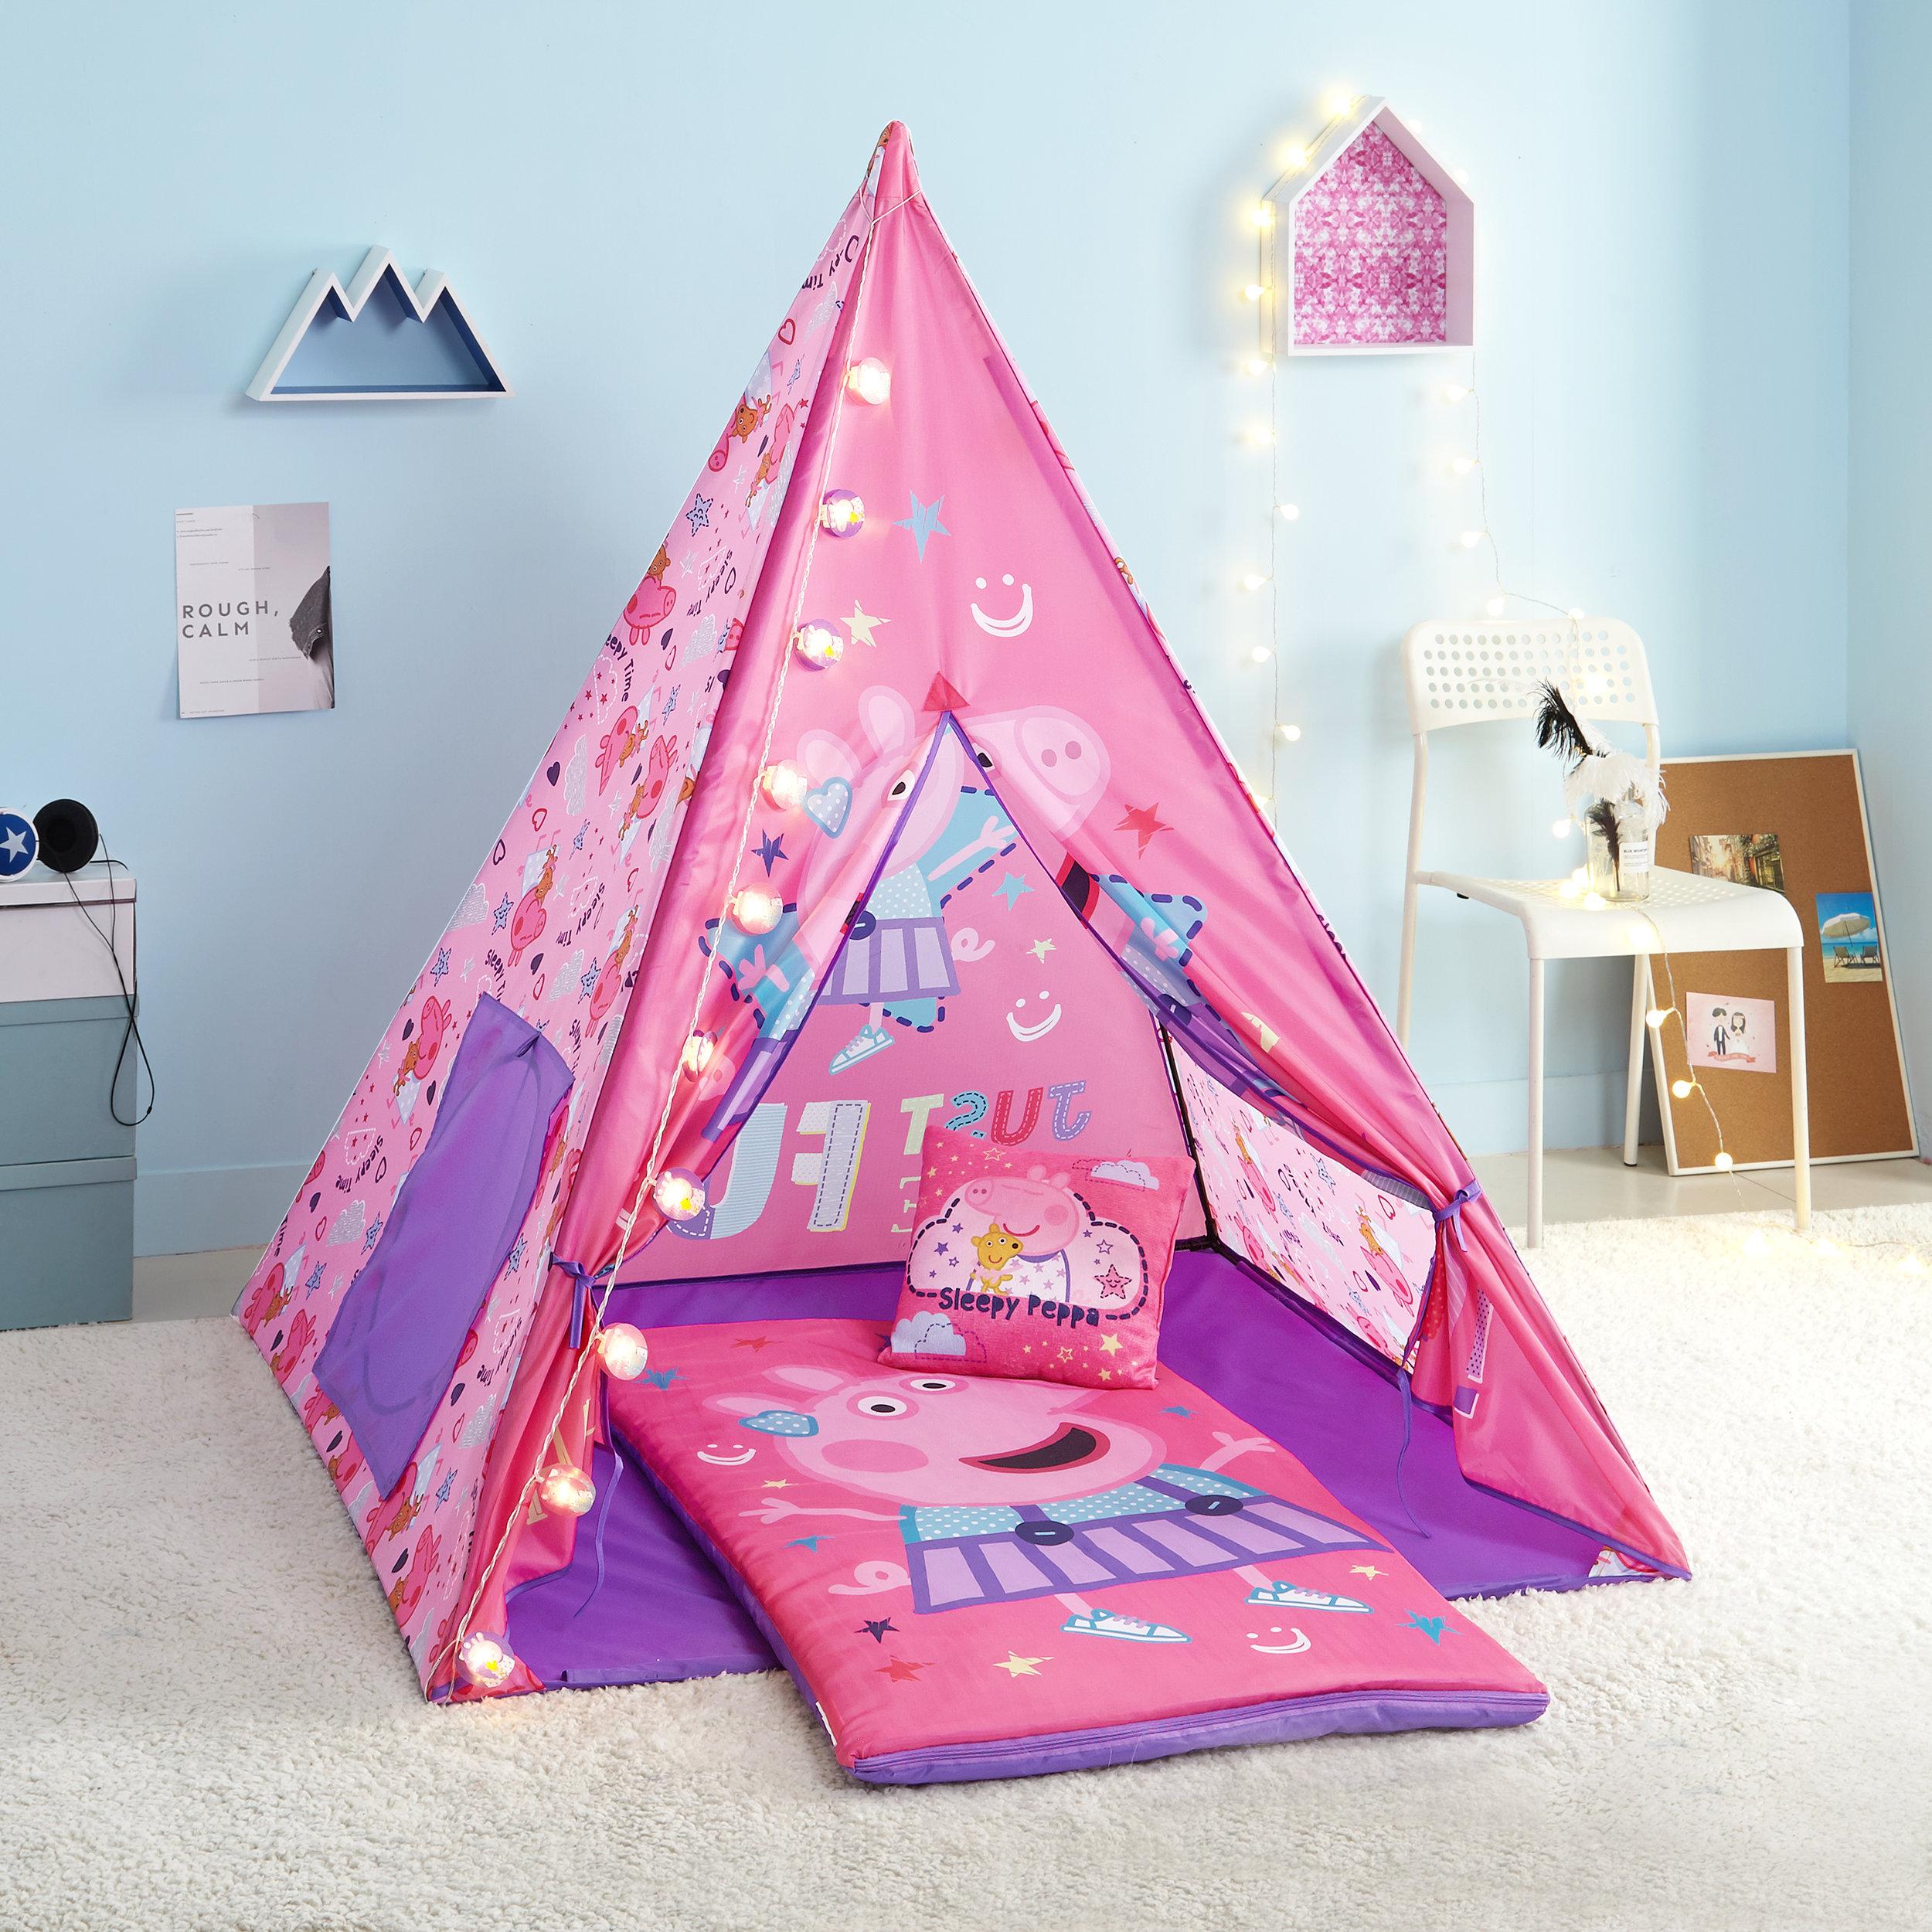 Peppa tent set.JPG